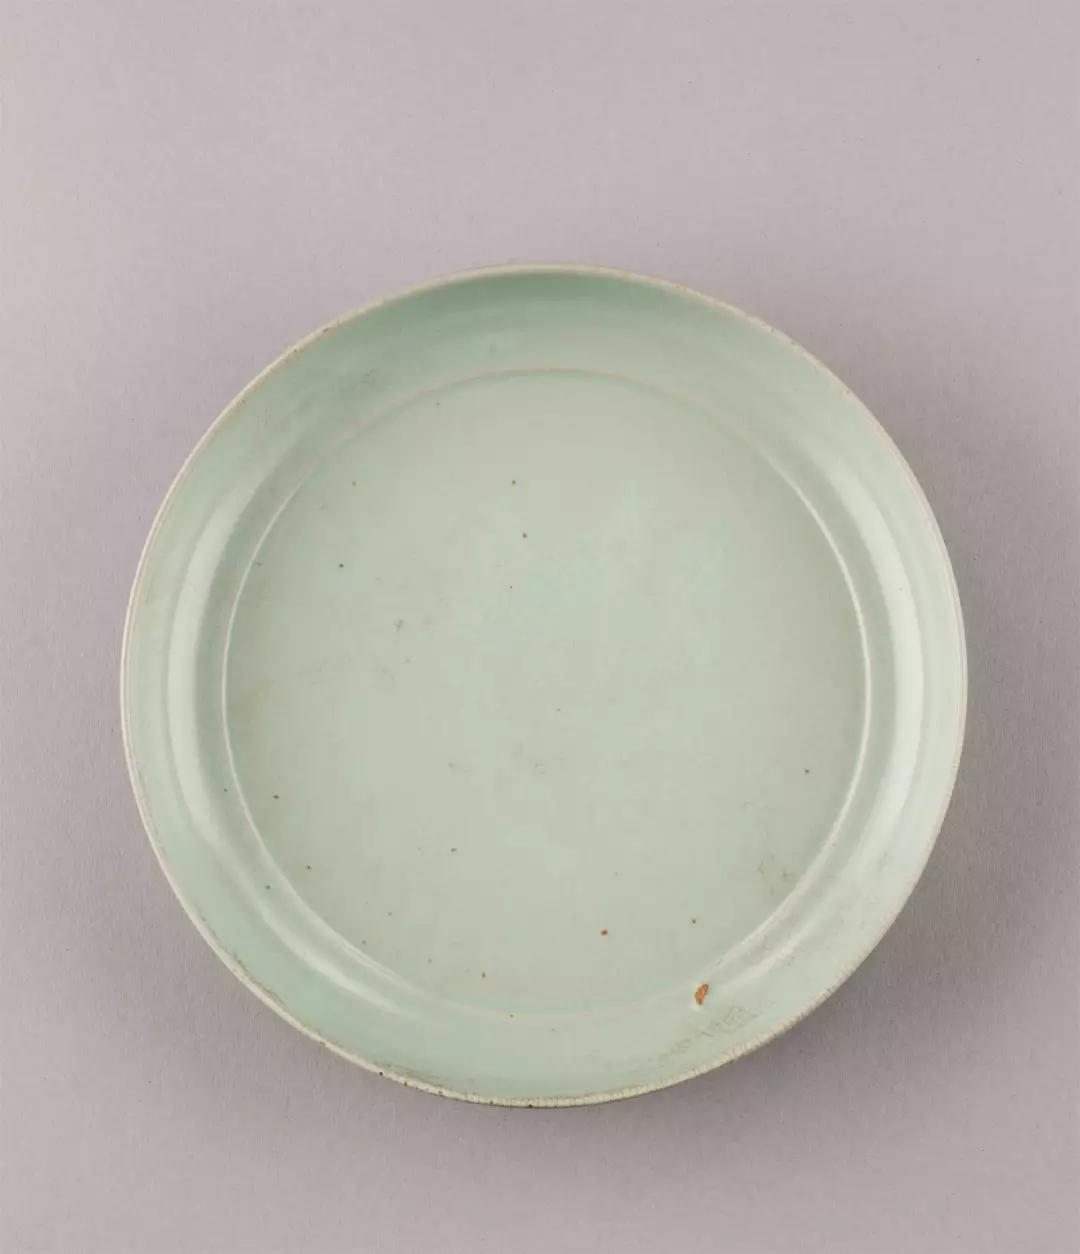 Lot 0280 唐代(618-907) 青瓷刻云纹瓜形盖瓶